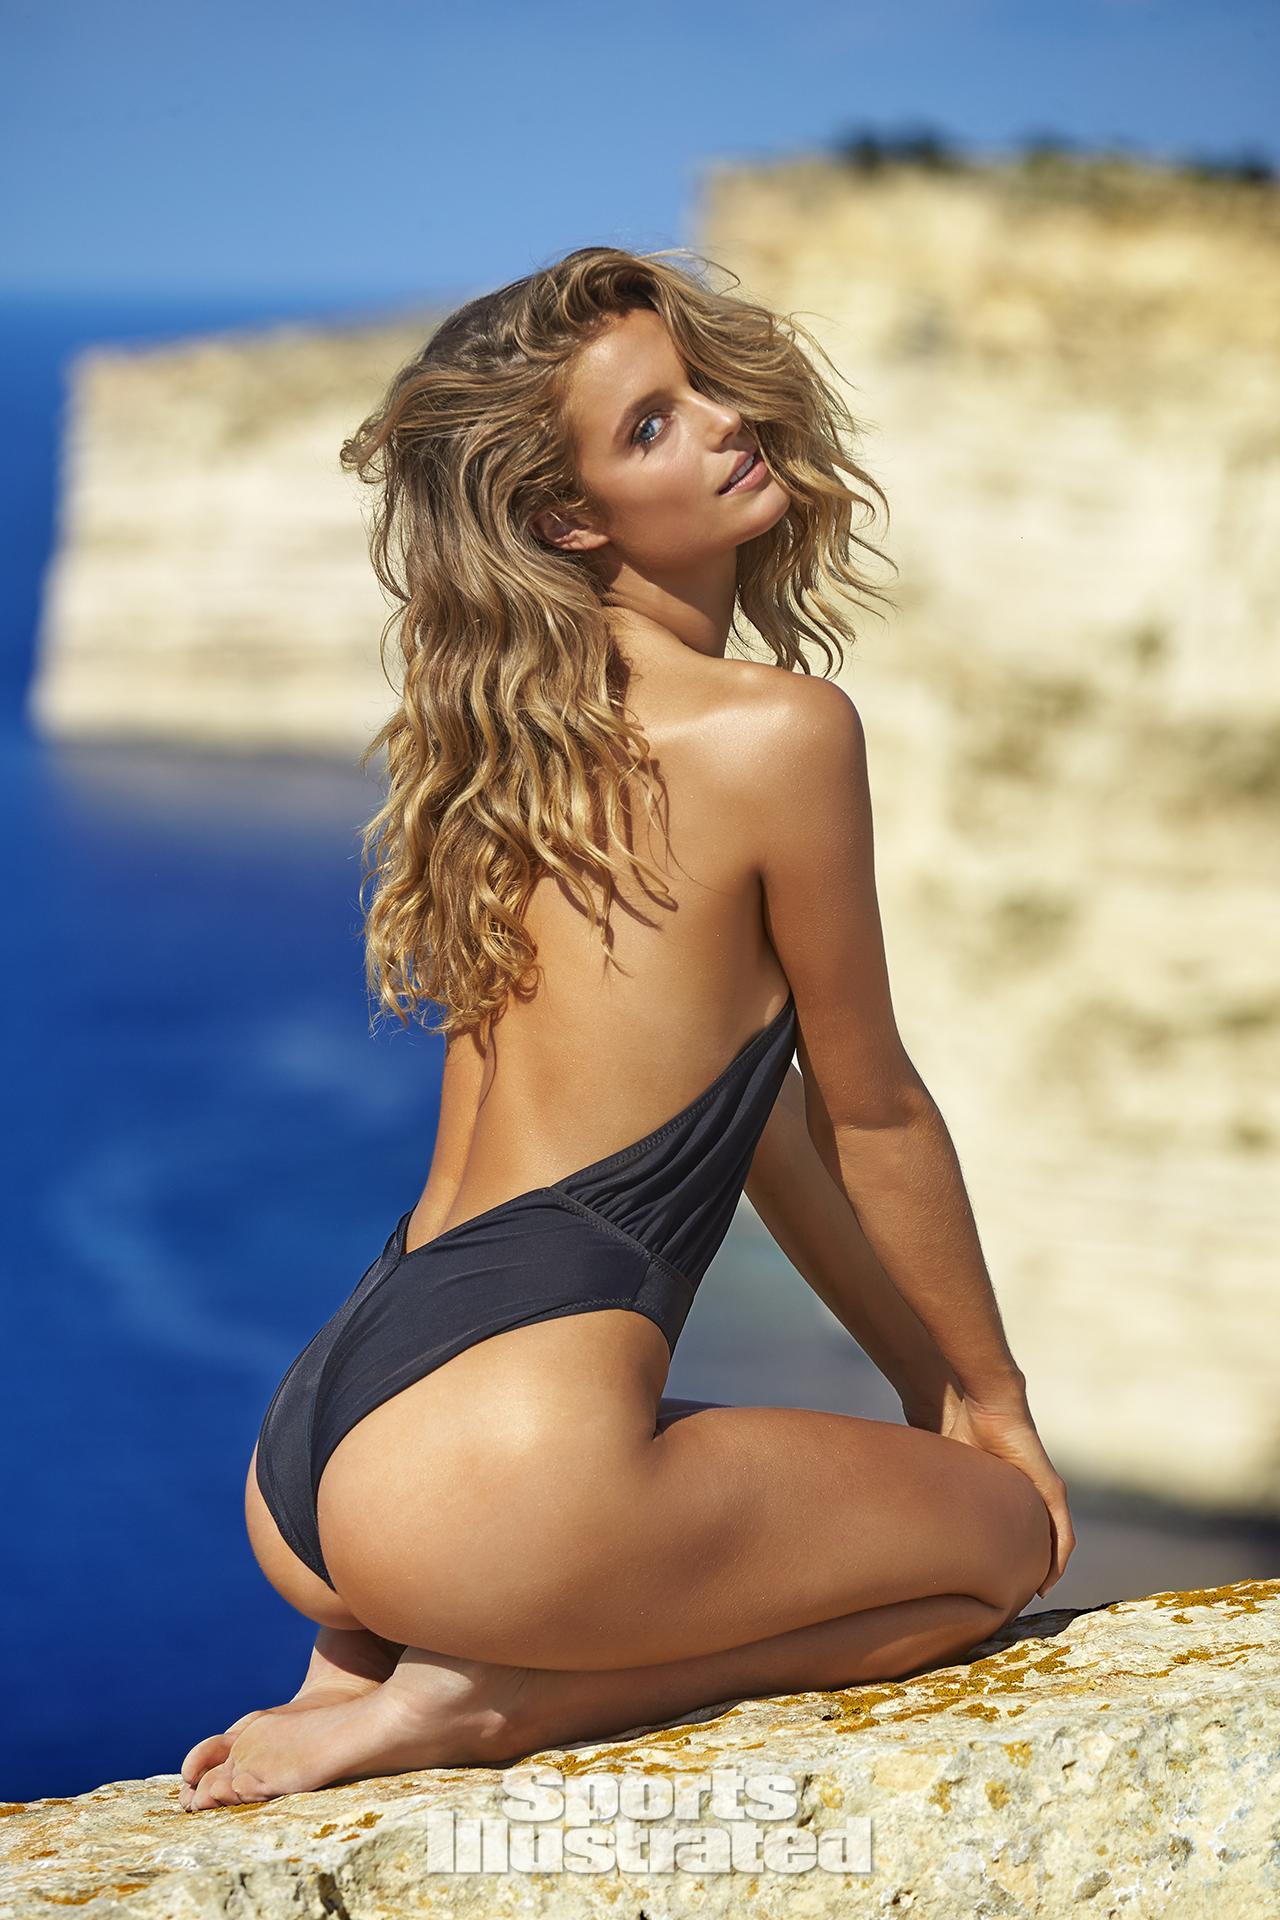 Kate Bock Sports Illustrated 2014 >> Kate Bock Swimsuit Photos, Sports Illustrated Swimsuit 2016